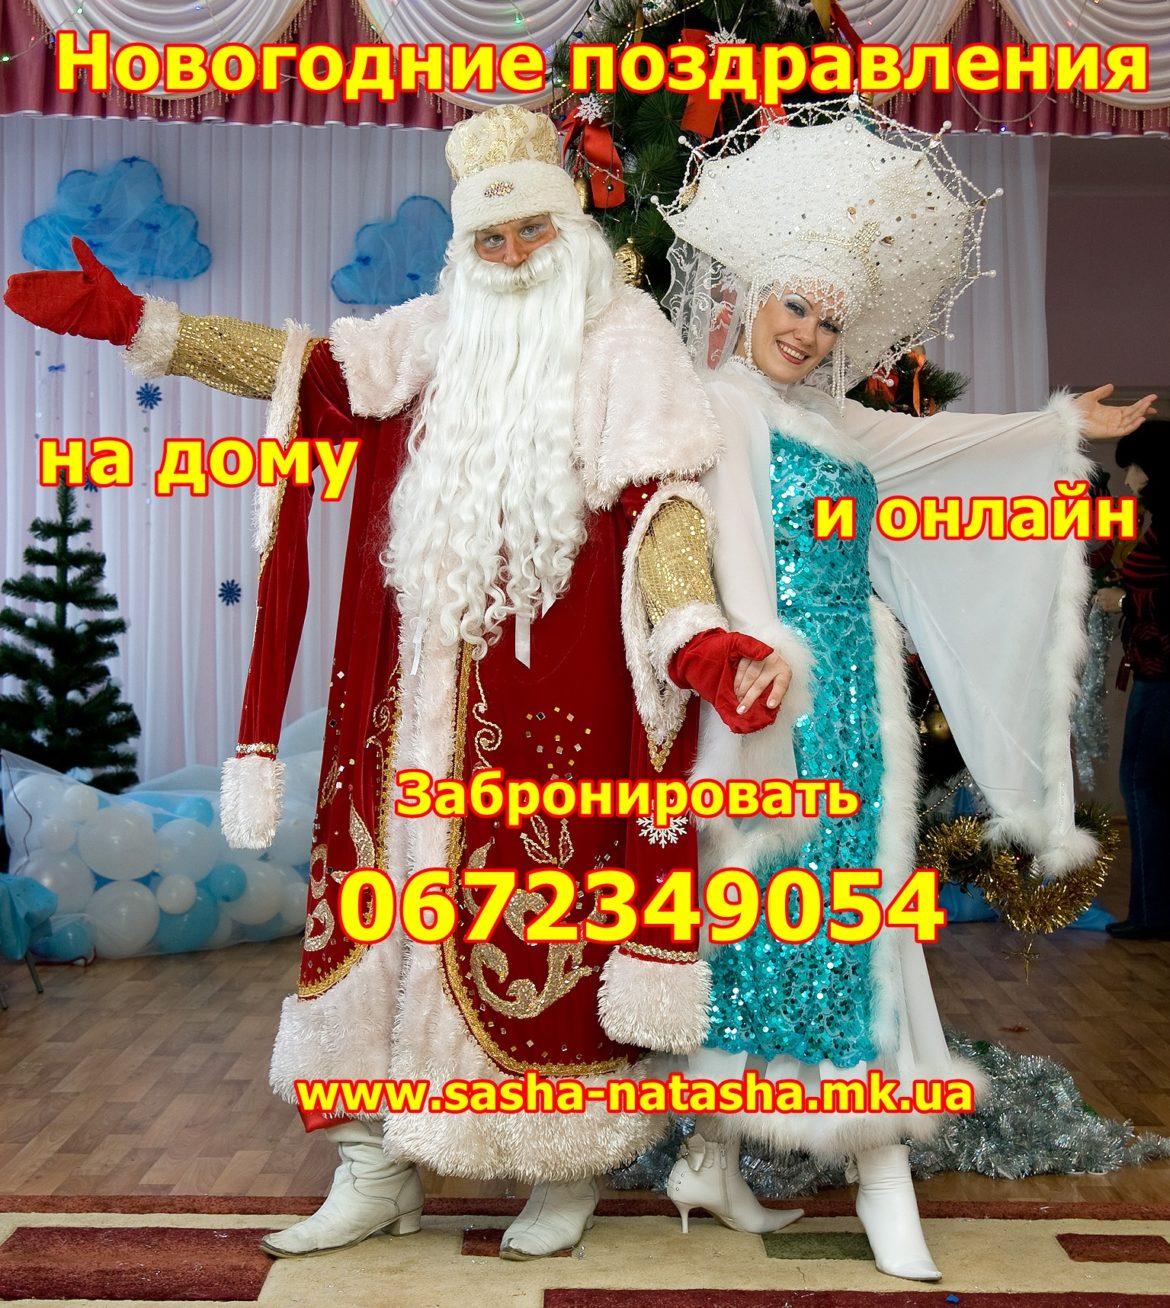 Дед Мороз на дом или онлайн?